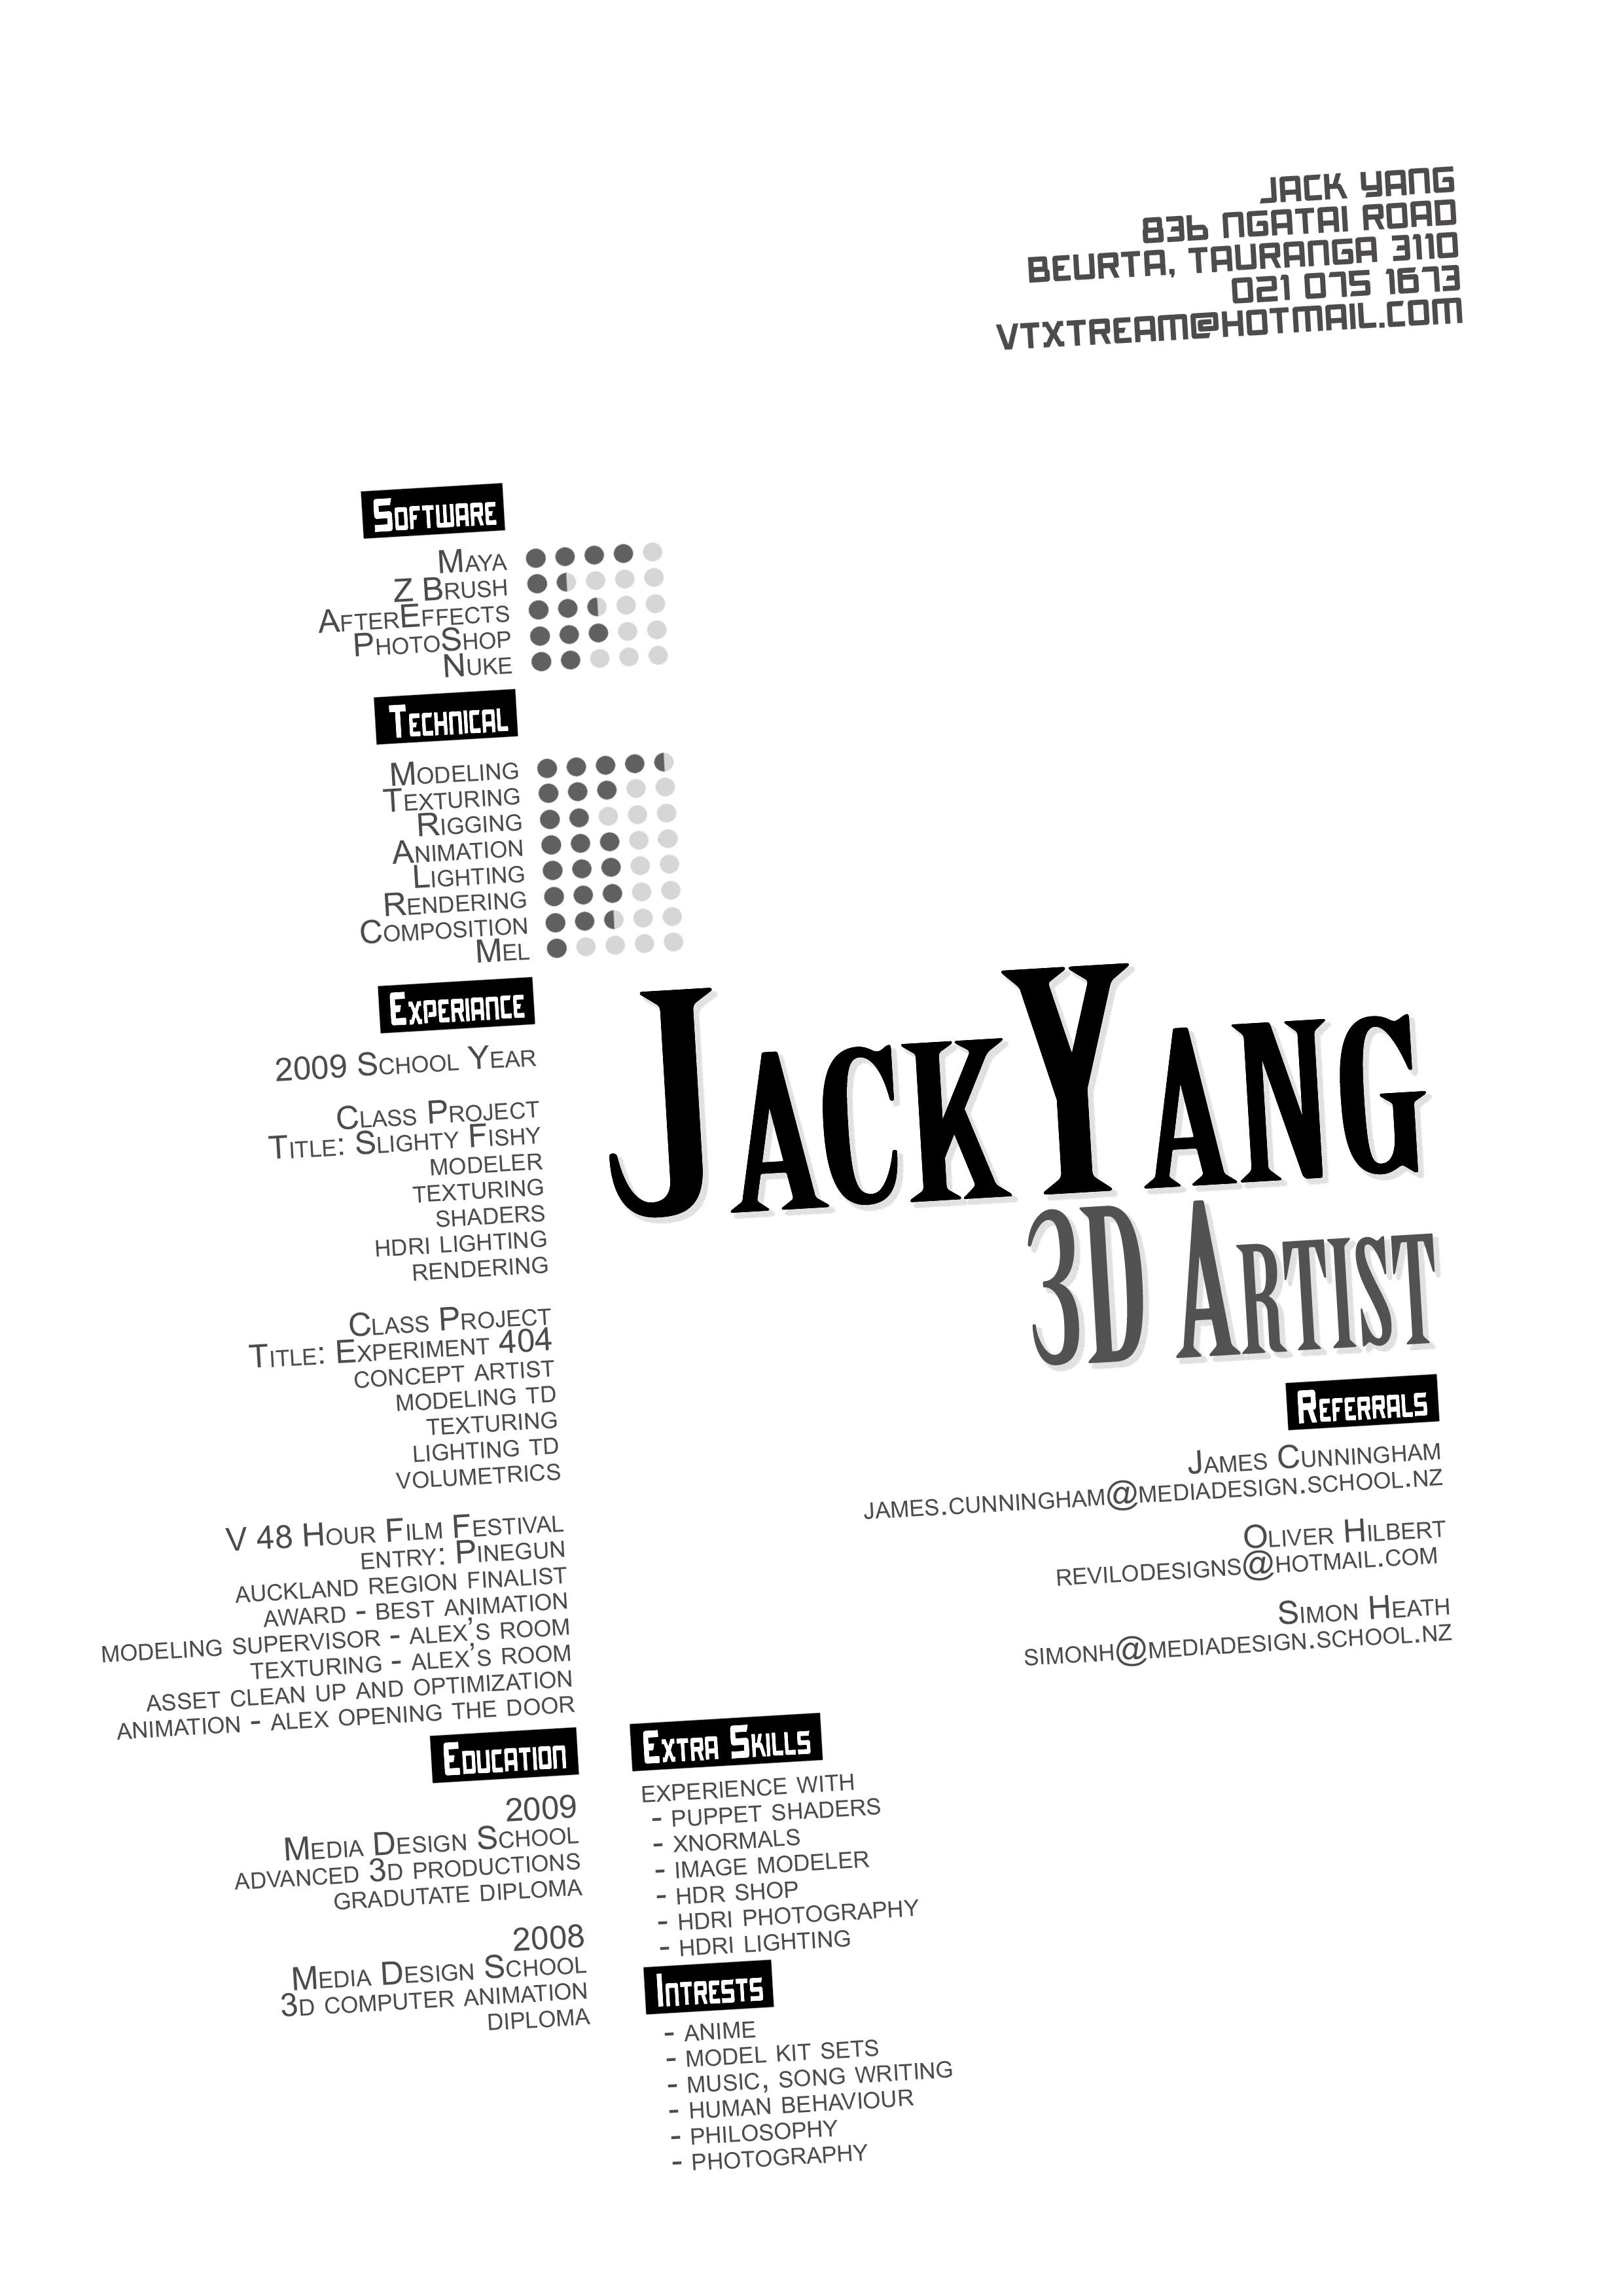 resume jack yang 3d artist